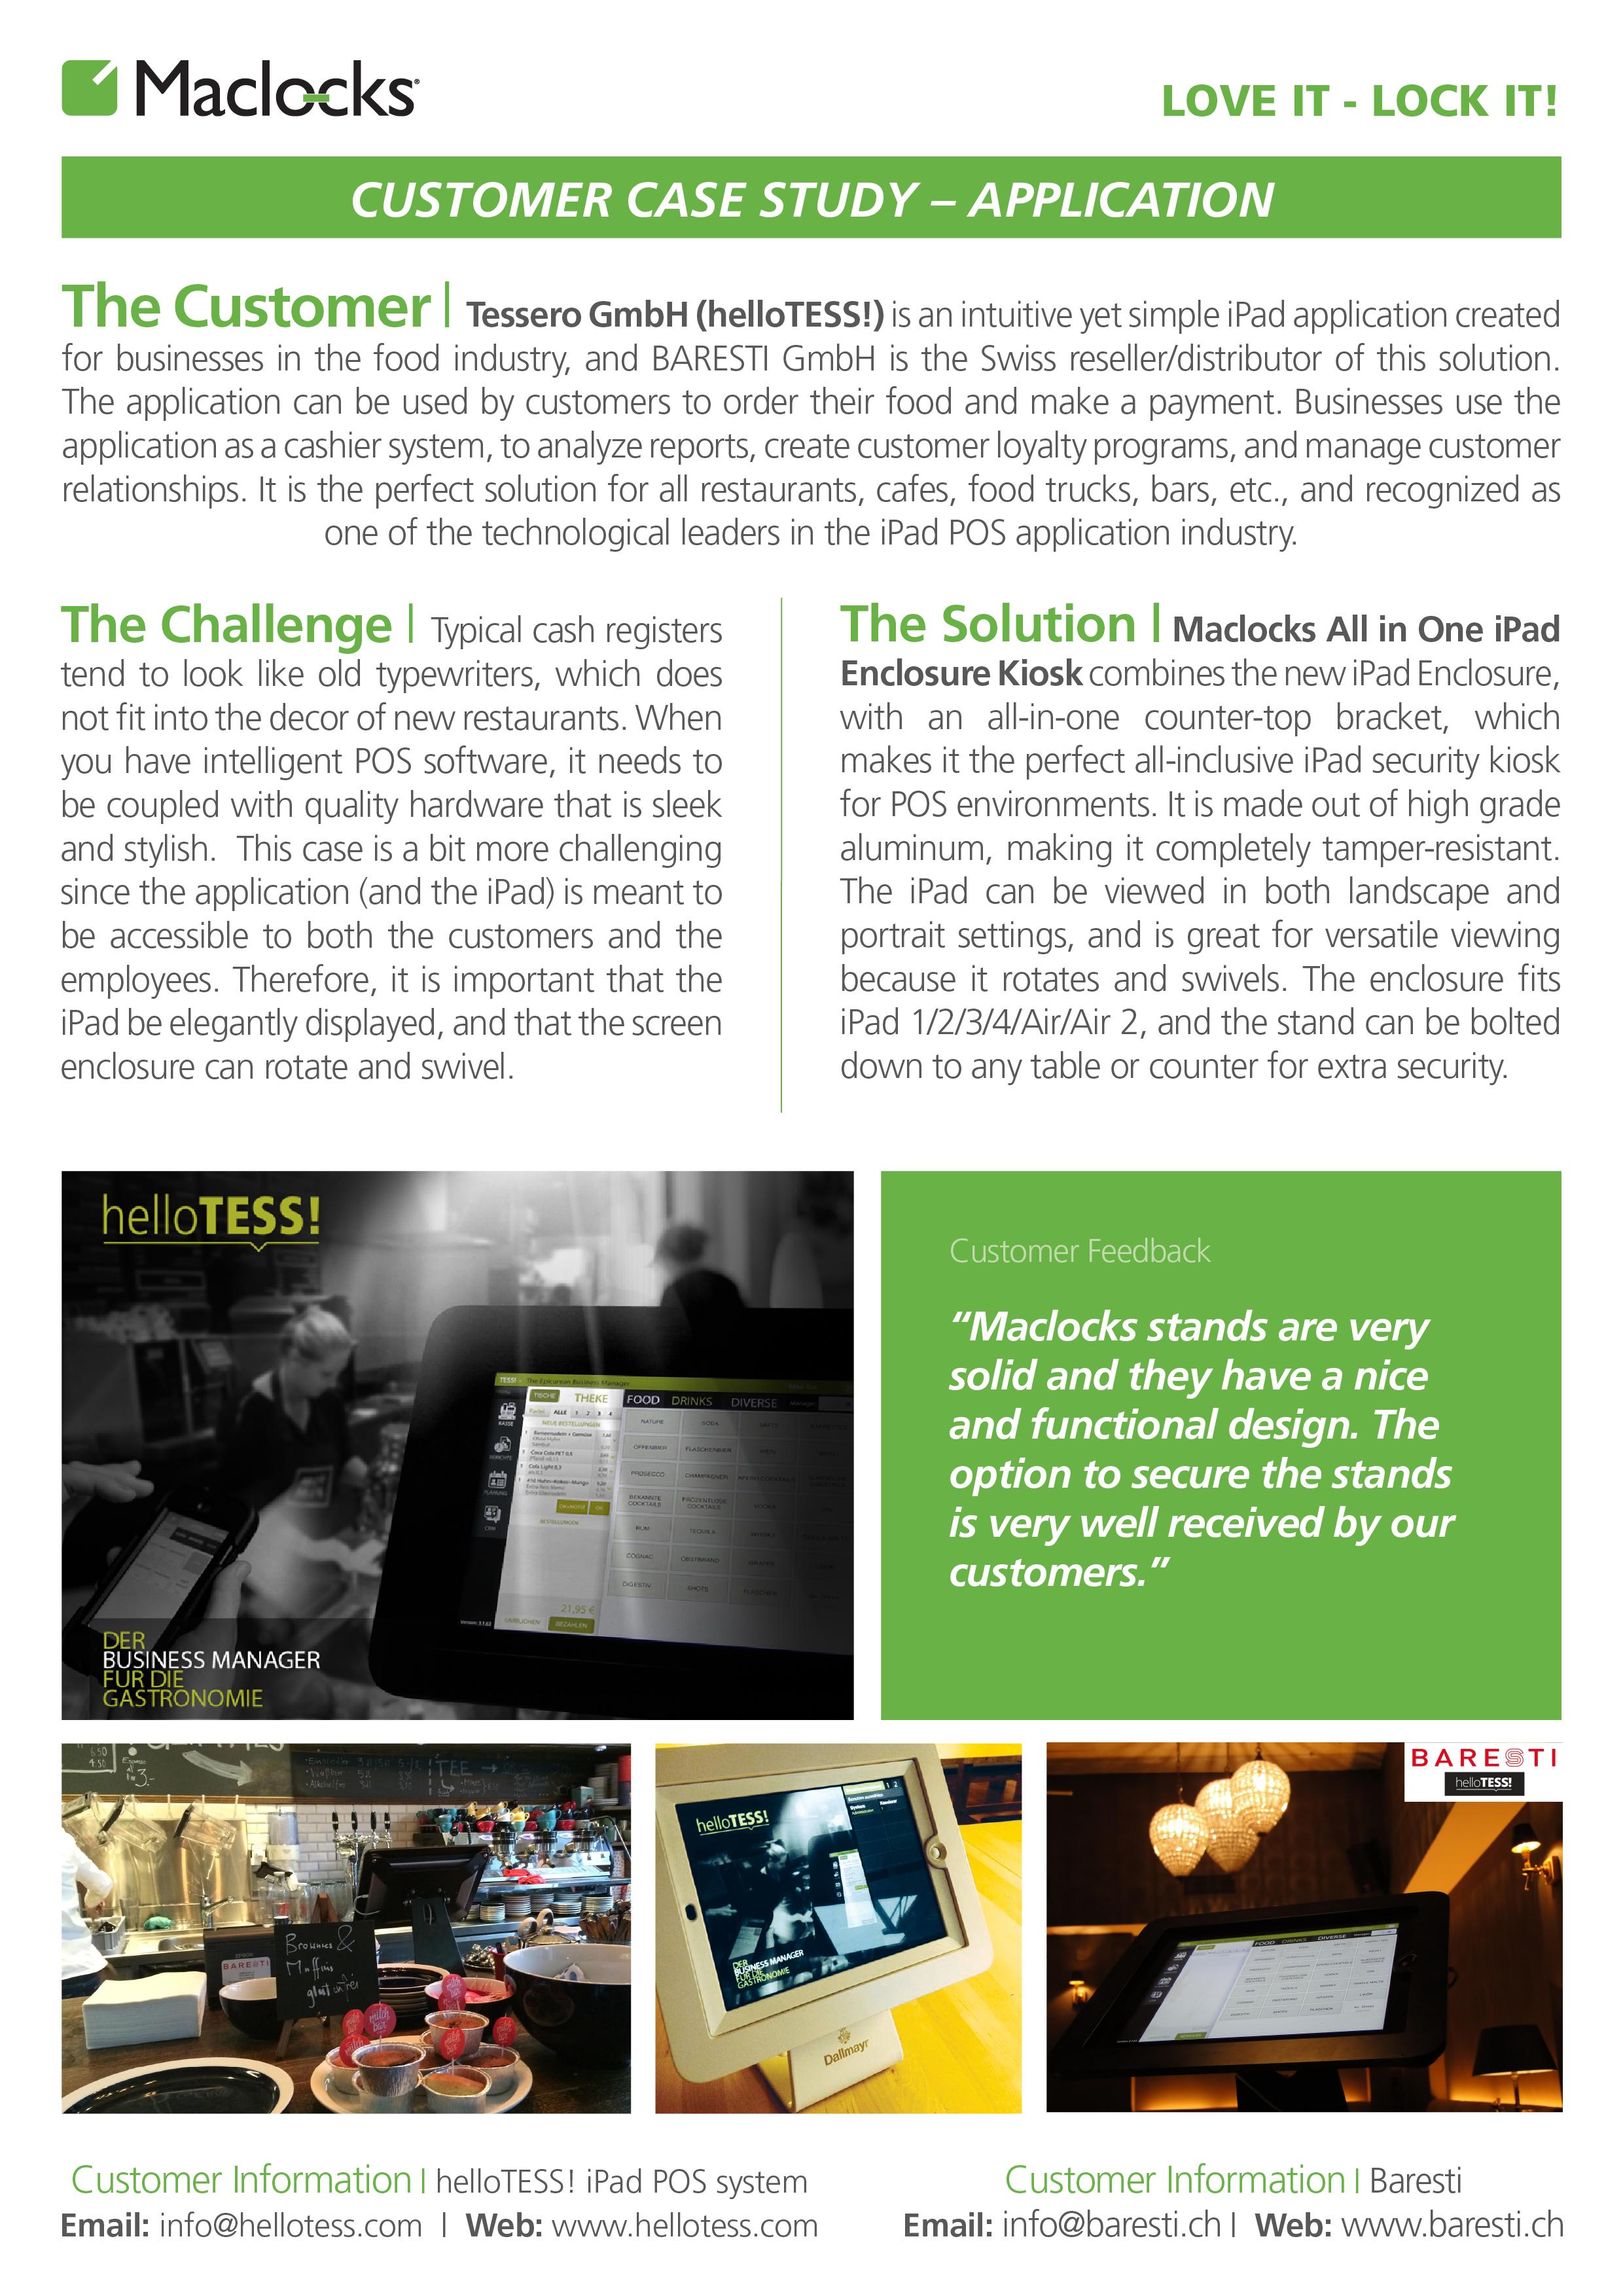 maclocks, case study, application, app, apps, applications, baresti, ipad, ipads, tablet, tablets, restaurant, restaurants, food